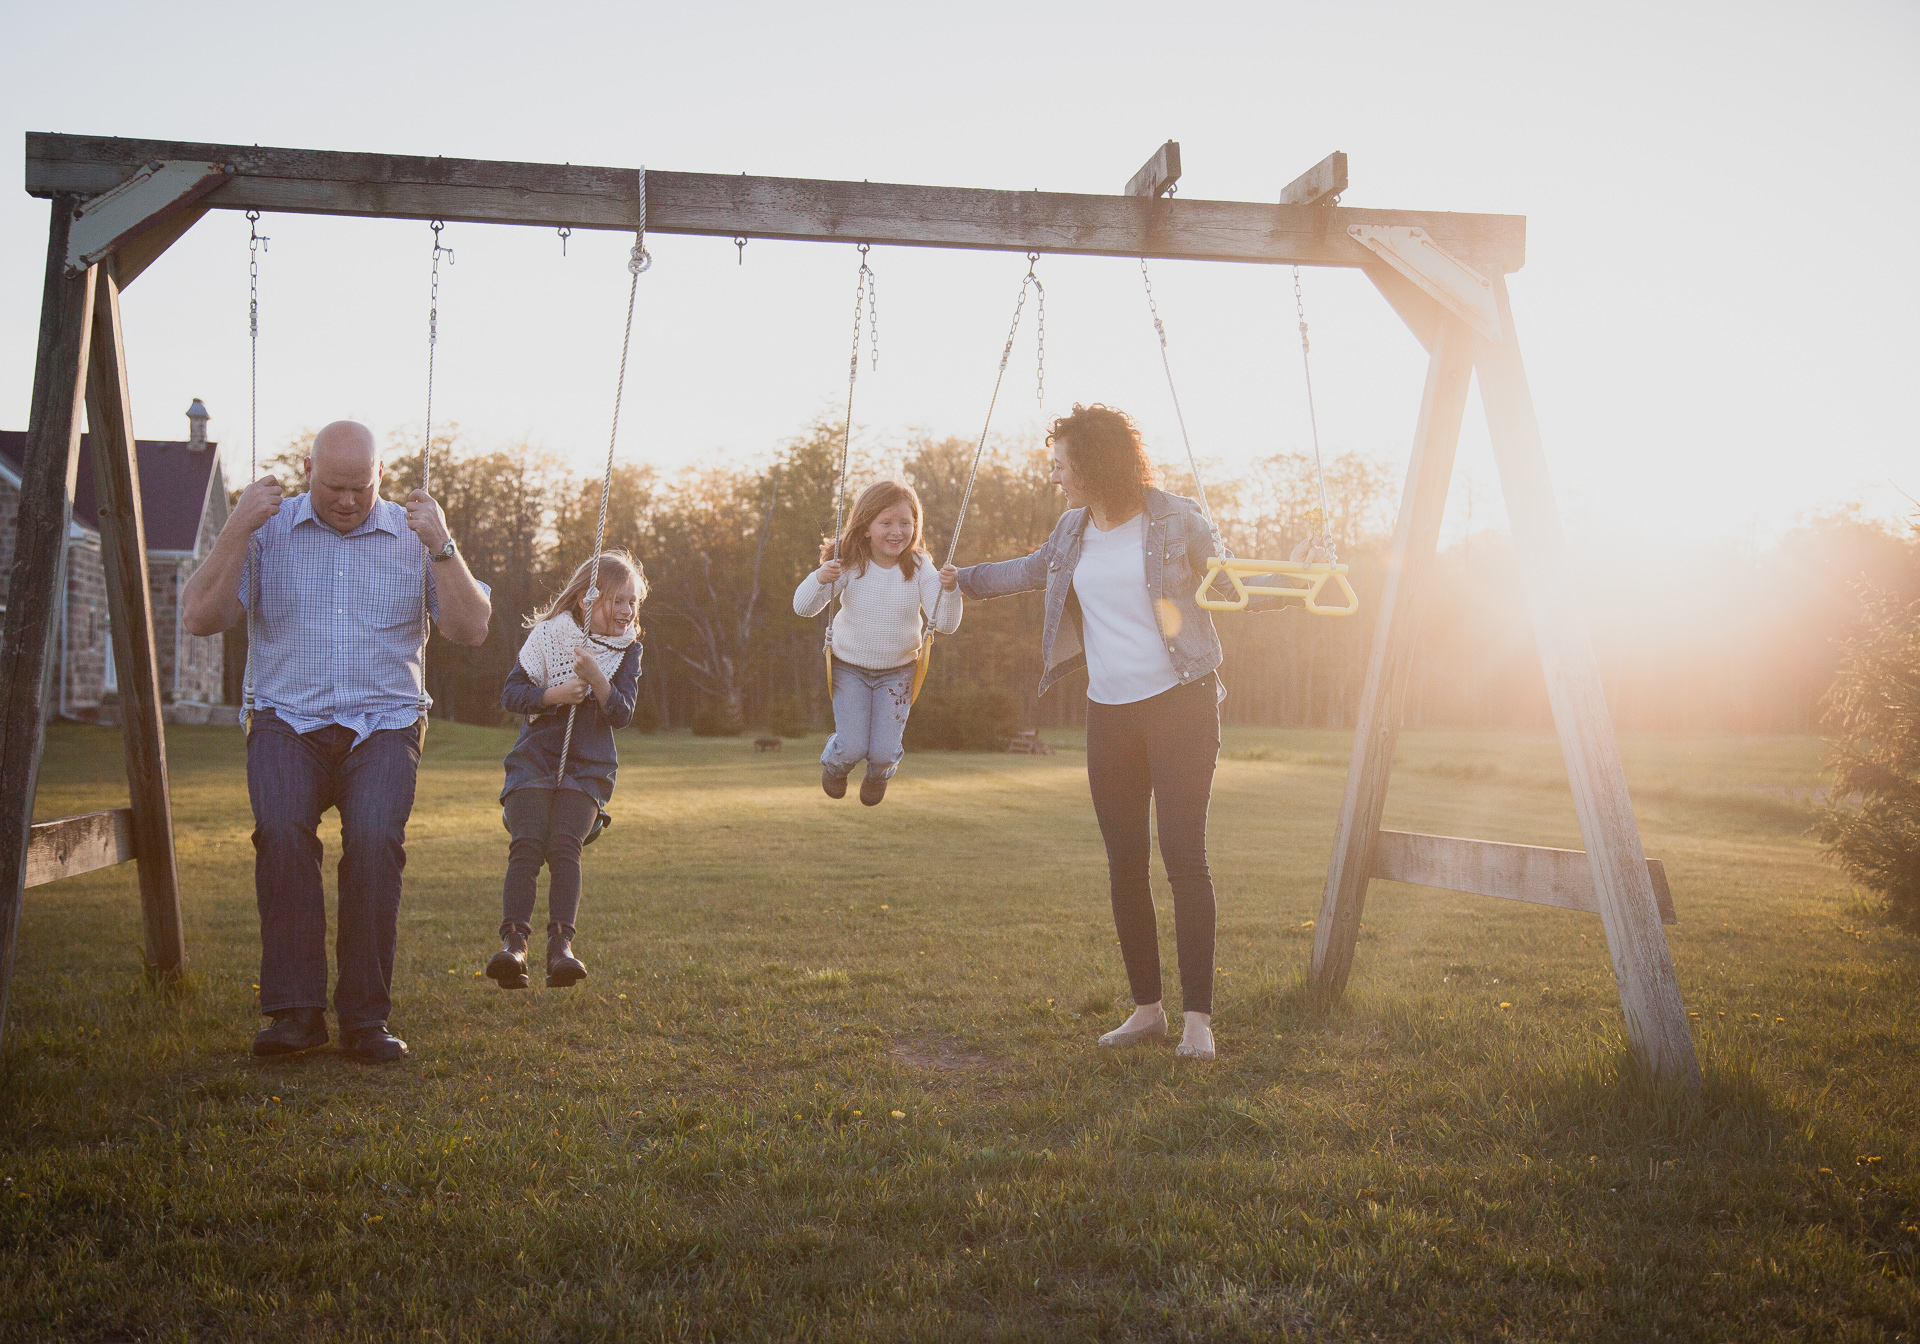 Bruce Peninsula family photograph